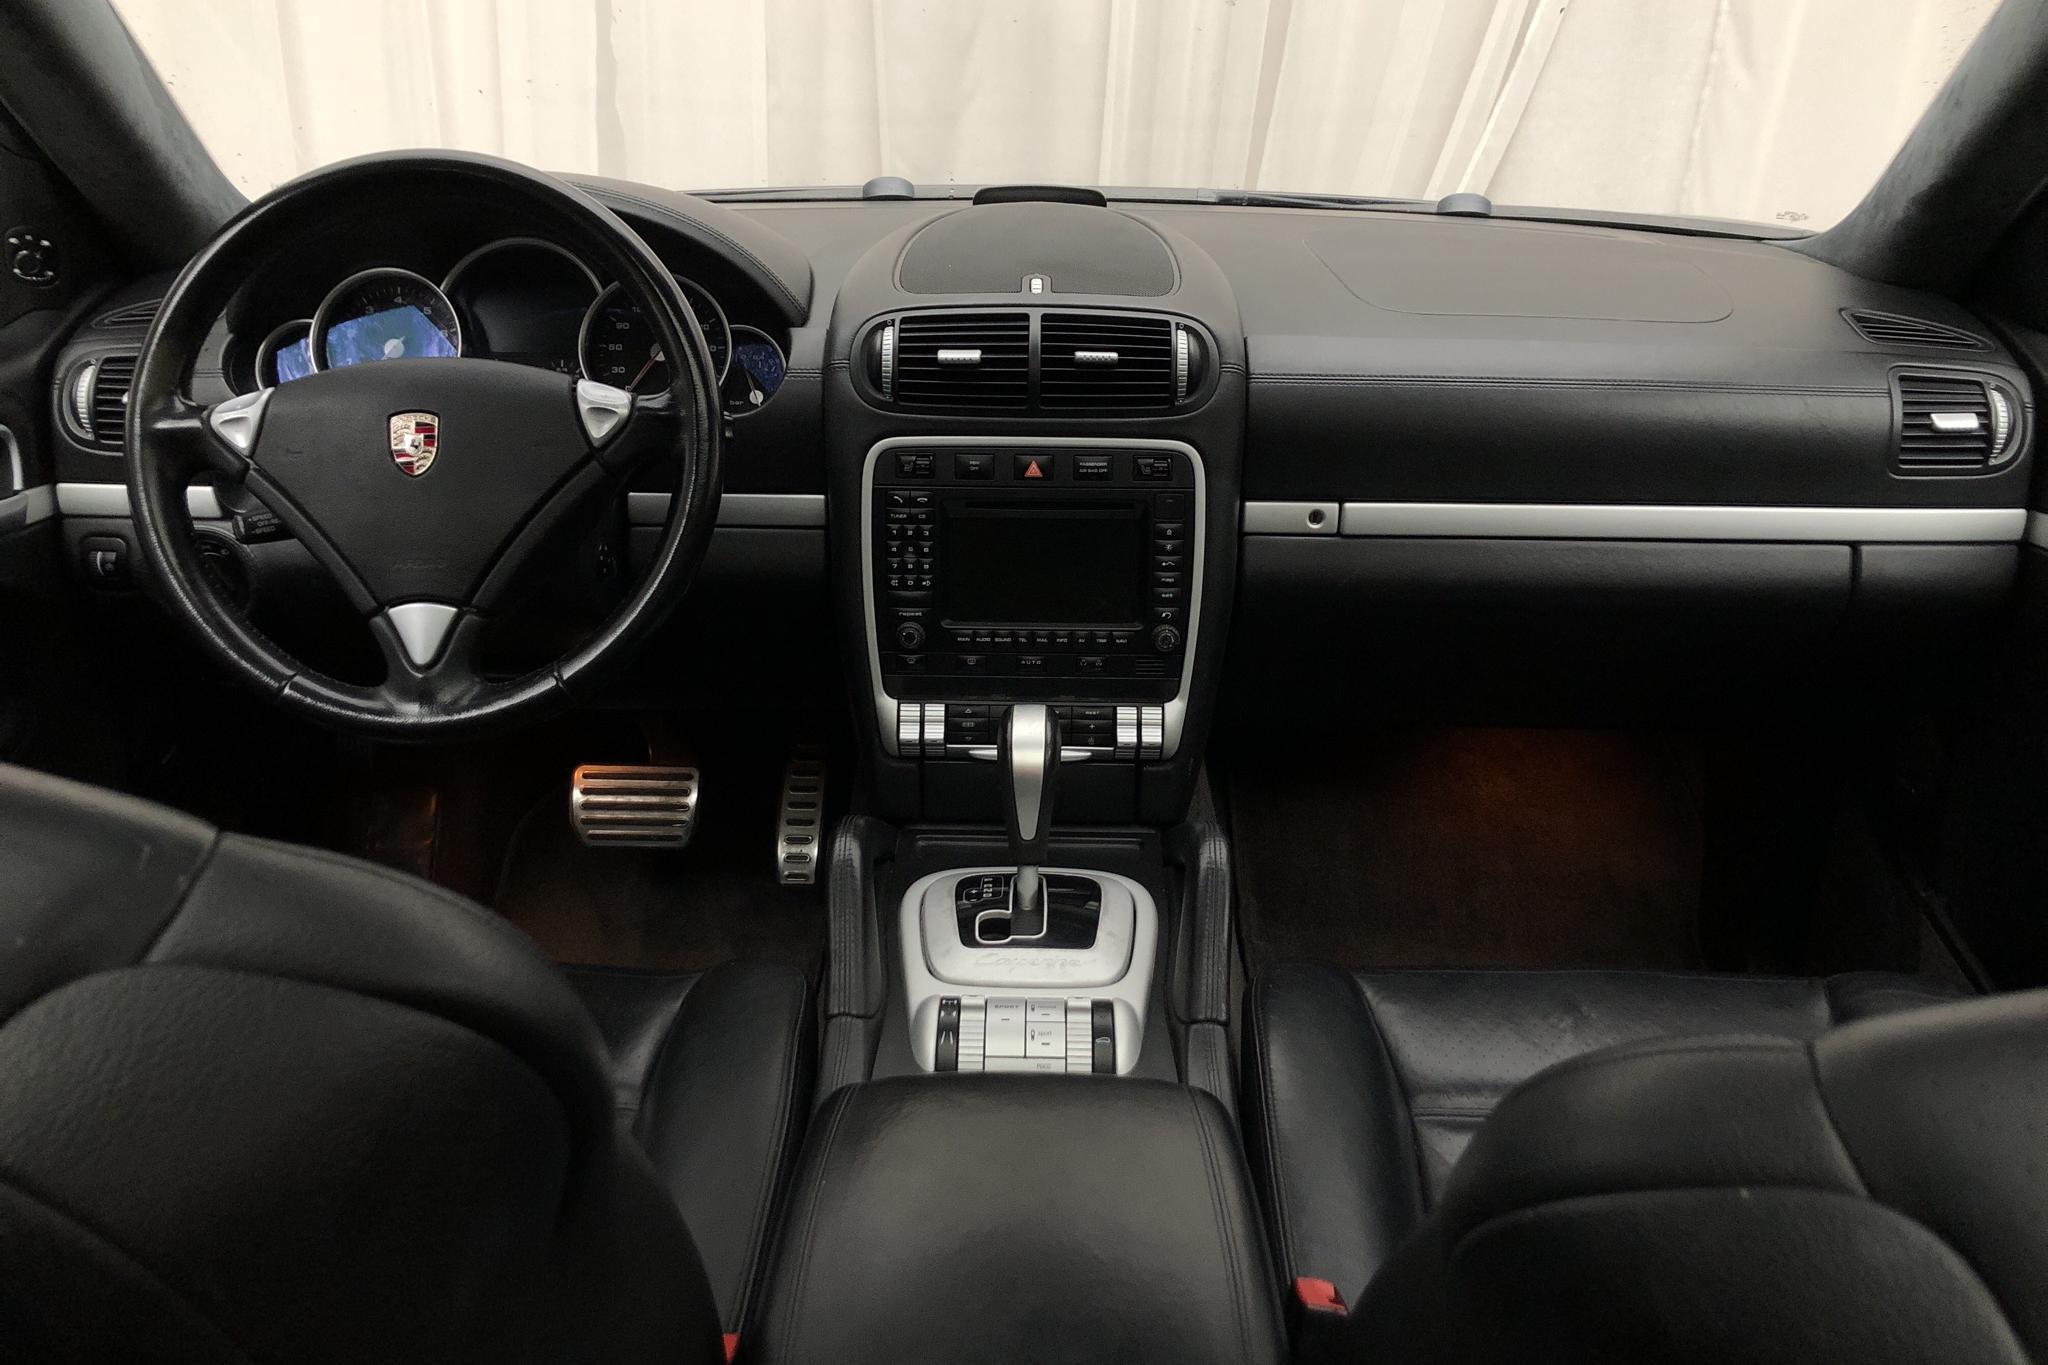 Porsche Cayenne 4.8 Turbo (500hk) - 252 980 km - Automatic - black - 2008